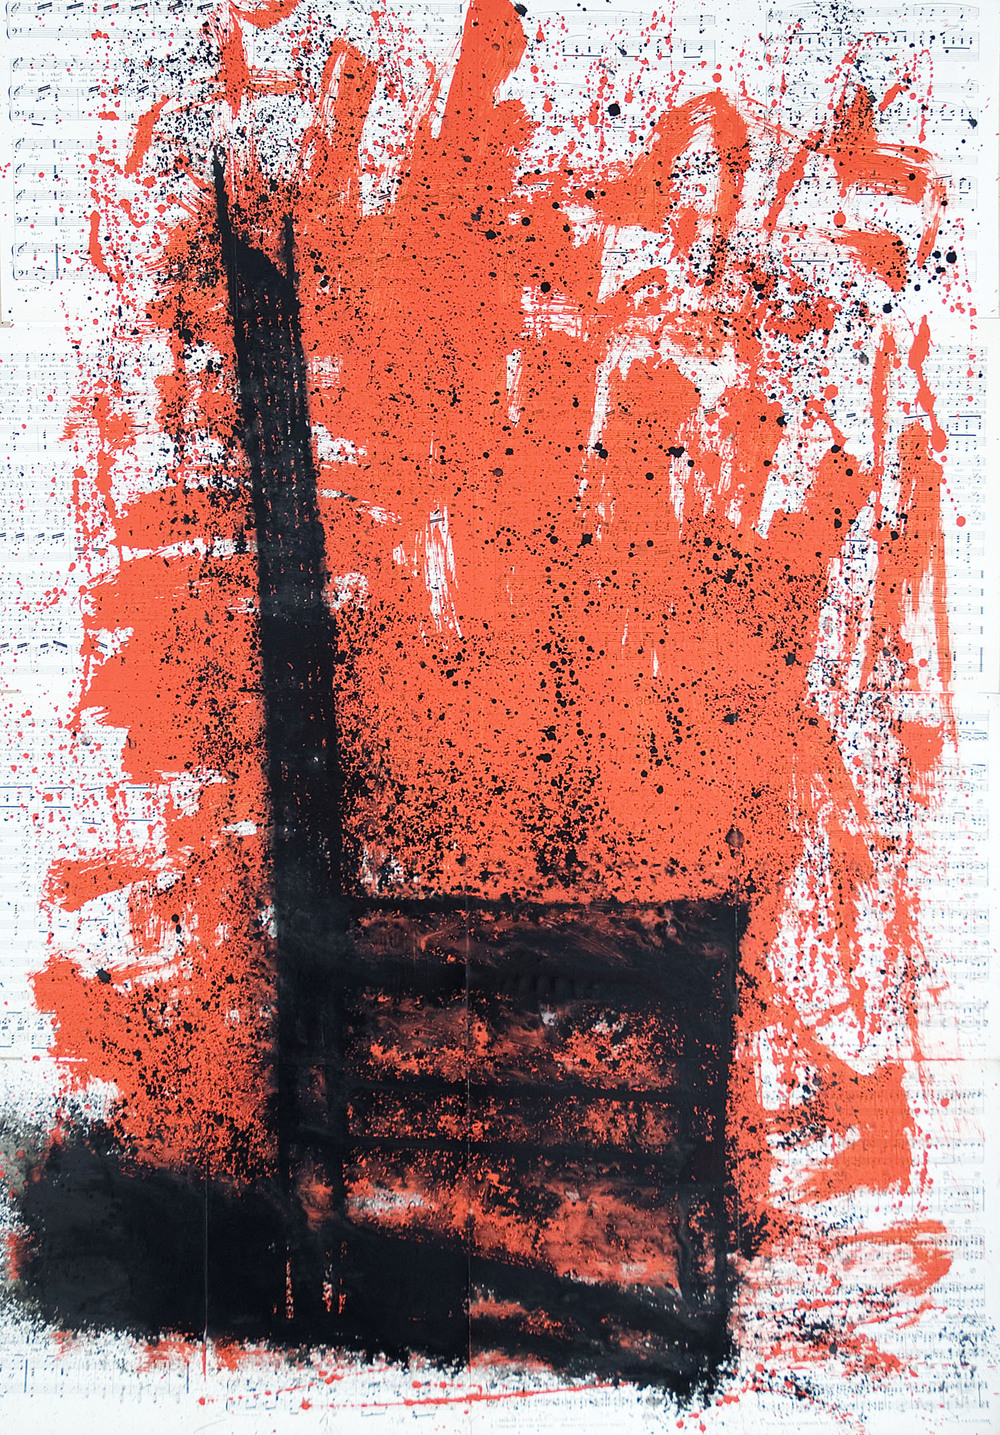 Neil Shawcross_2007_Chair #22_acrylic on paper_135 x 91.5cm.jpg